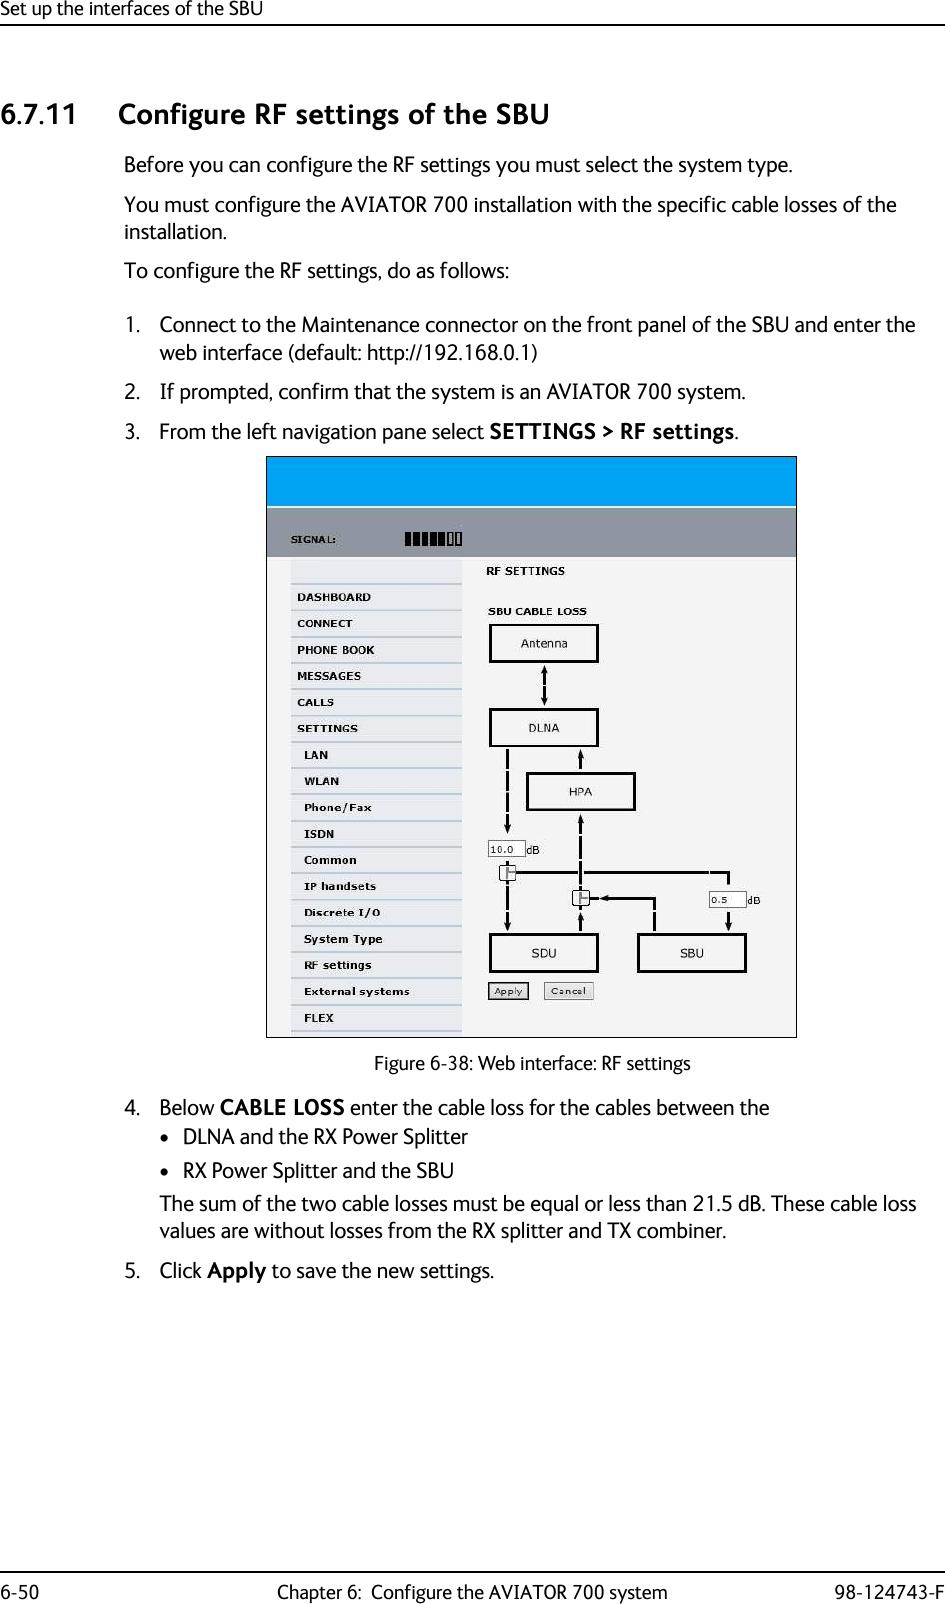 medium resolution of thrane and thrane a s aviator700 satellite transceiver for inmarsat swift broadband service user manual 98 124743